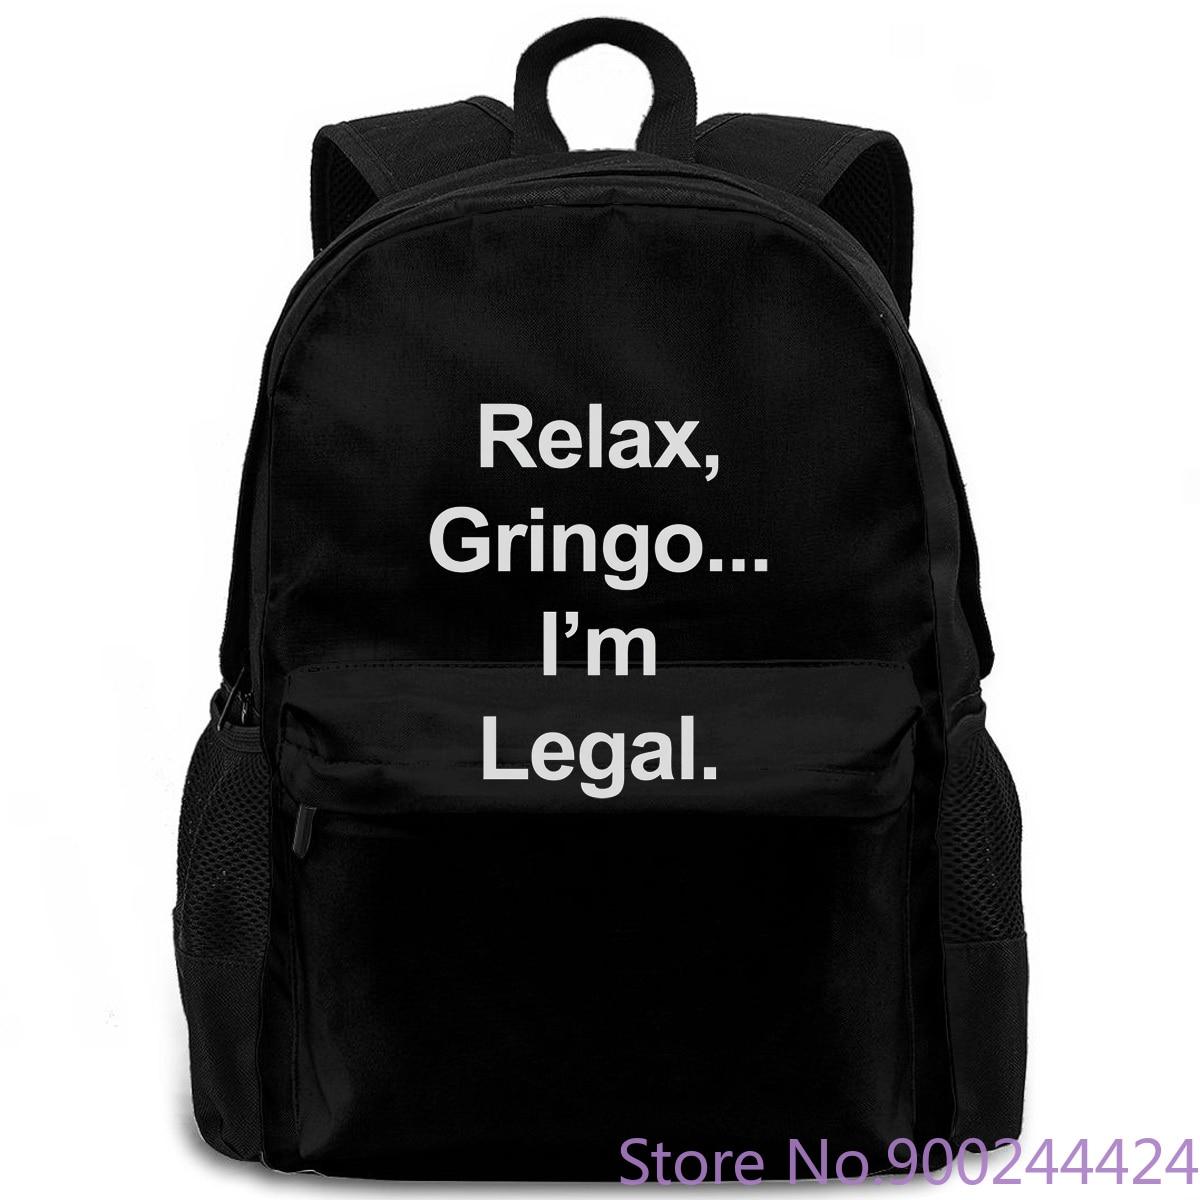 Relax Gringo soy Legal mexicano Humor español MEME México orgullo mujeres hombres mochila laptop viaje escuela estudiante adulto